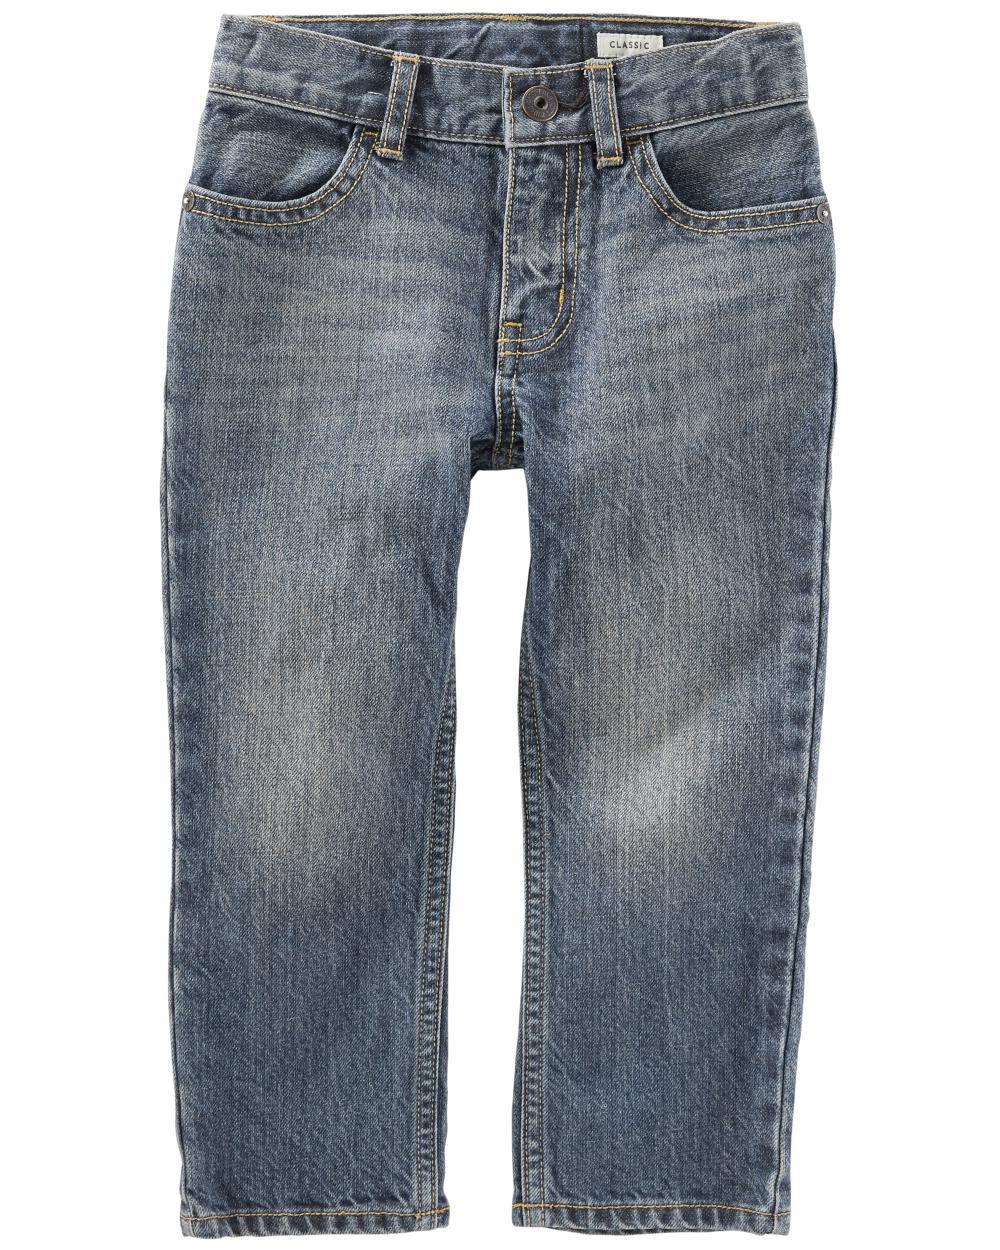 *DOORBUSTER*Classic Jeans - Rail Tie True Blue Wash